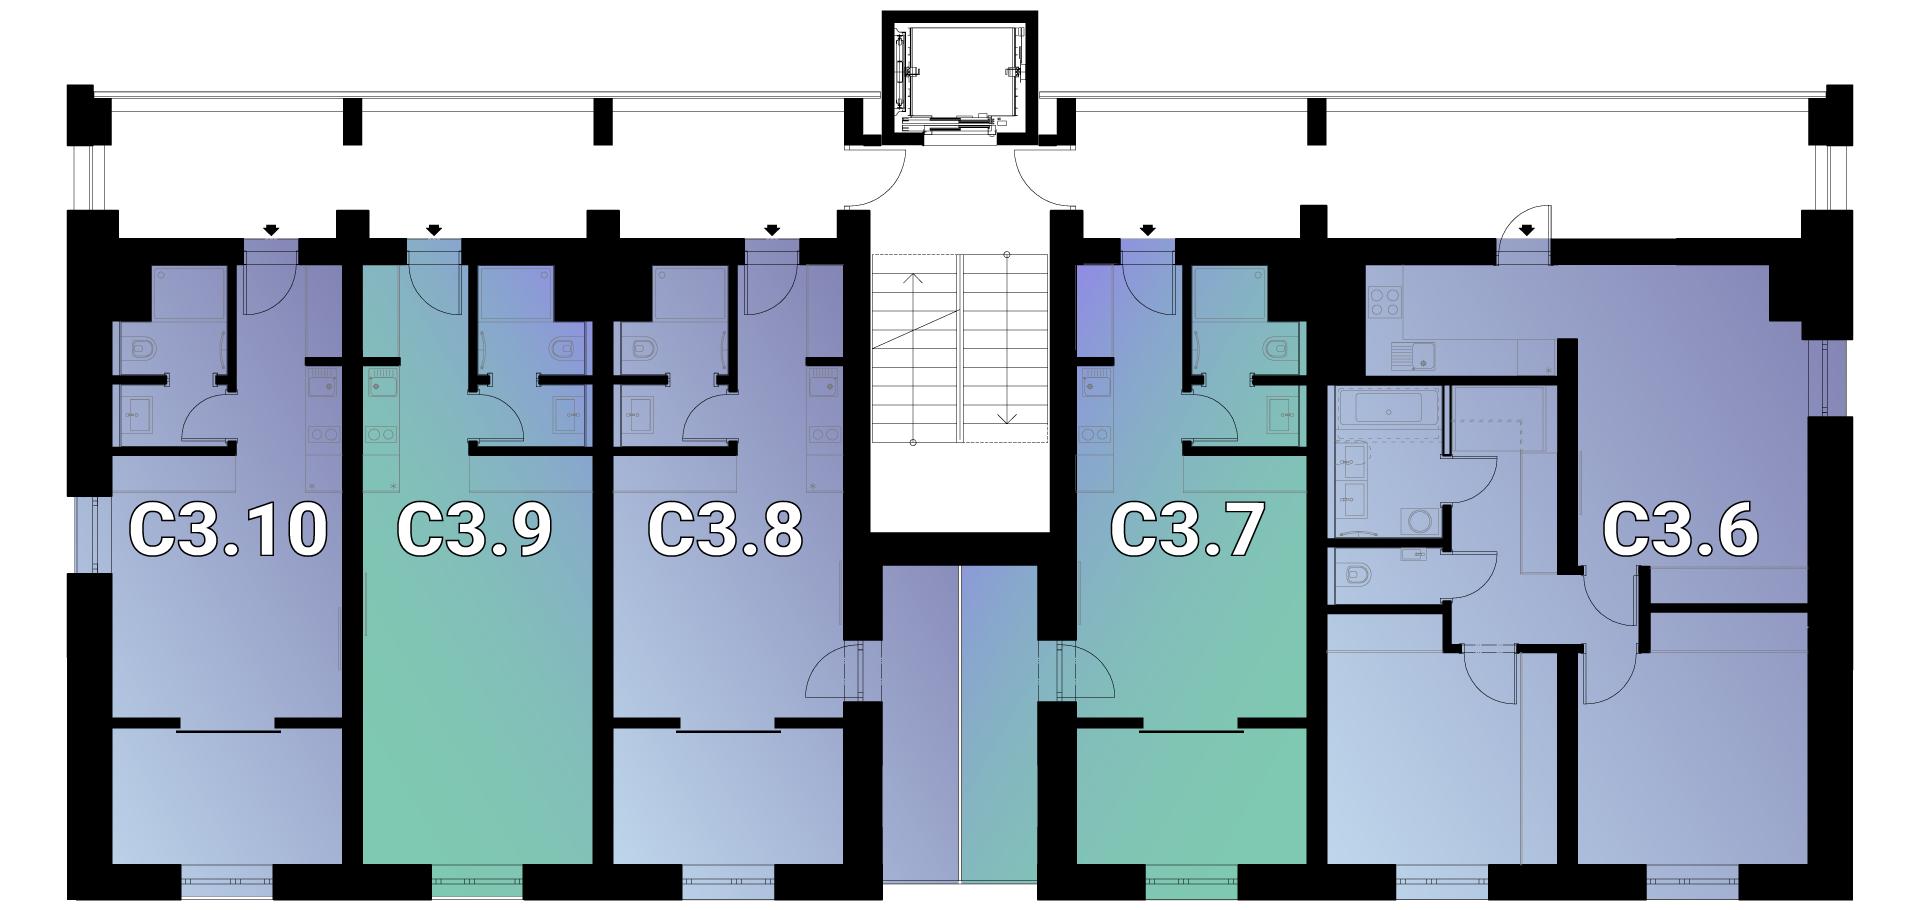 Klinovec-APTC-ALL-v4.1-2NP.png